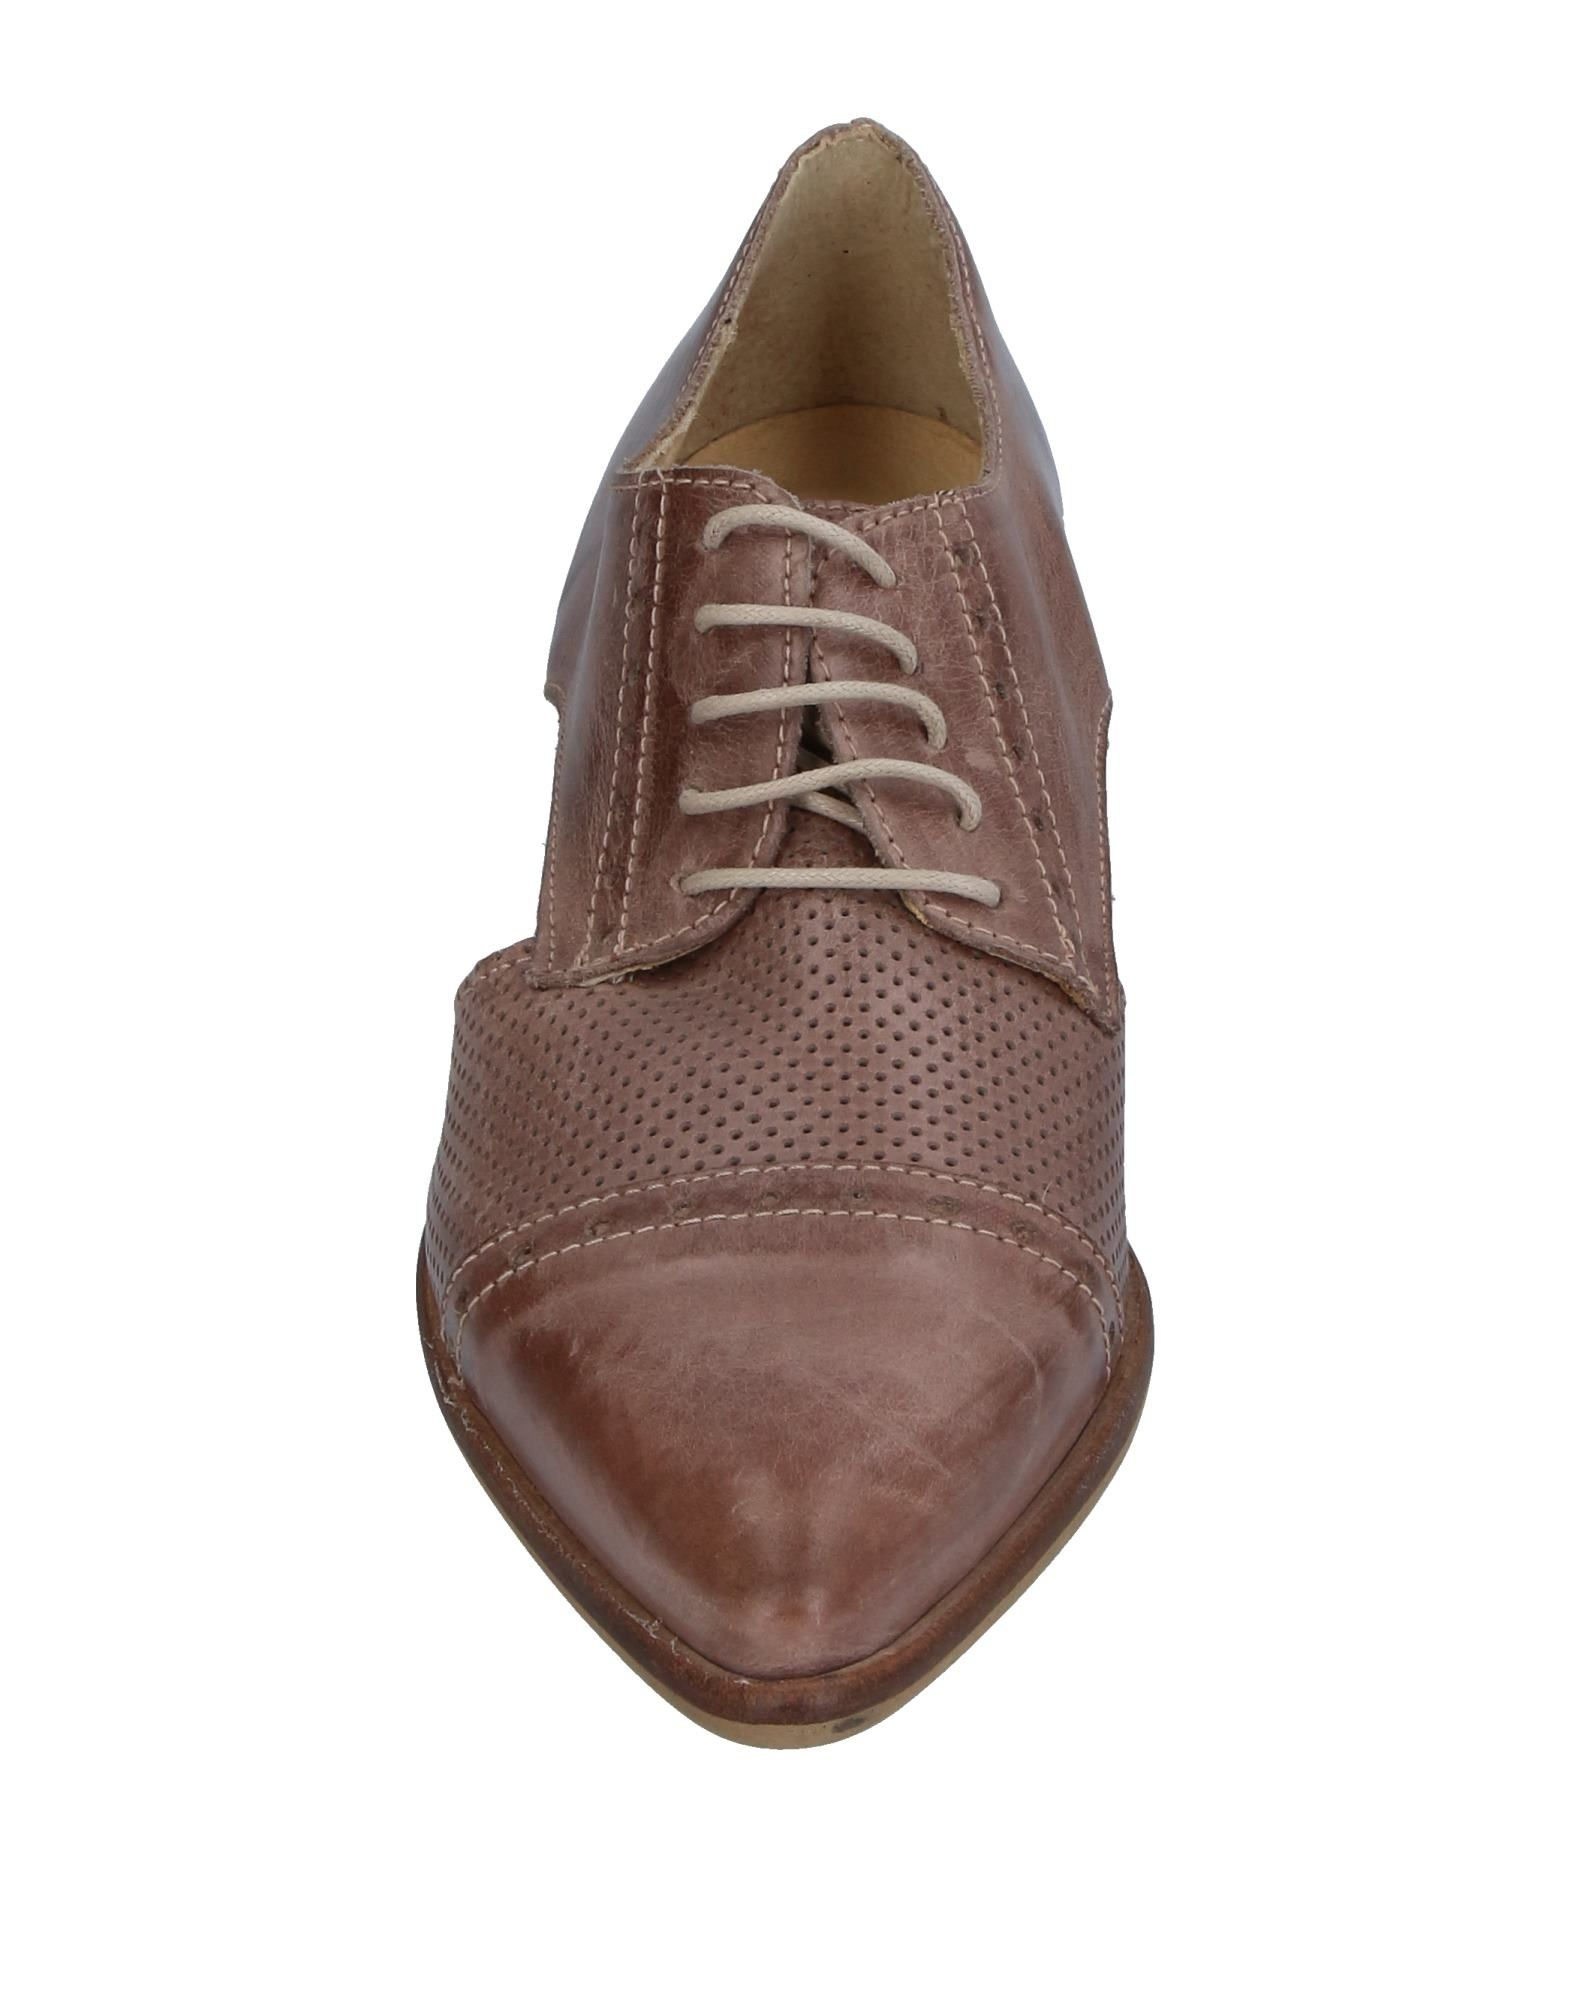 Chaussures - Tribunaux Ovye Par Cristina Lucchi gVRGUPmT5